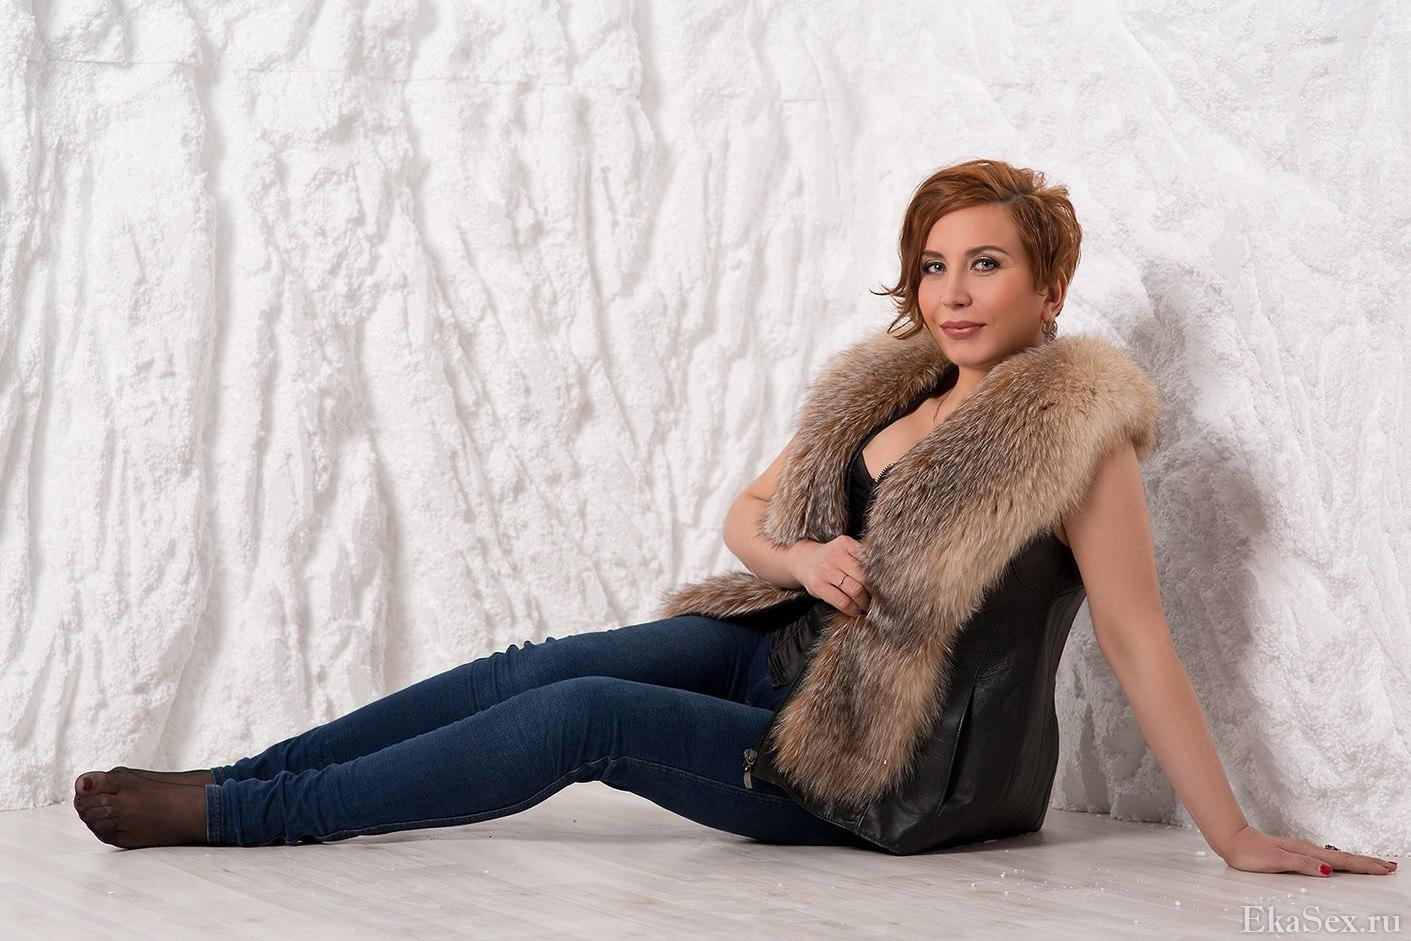 фото проститутки Тамара из города Екатеринбург